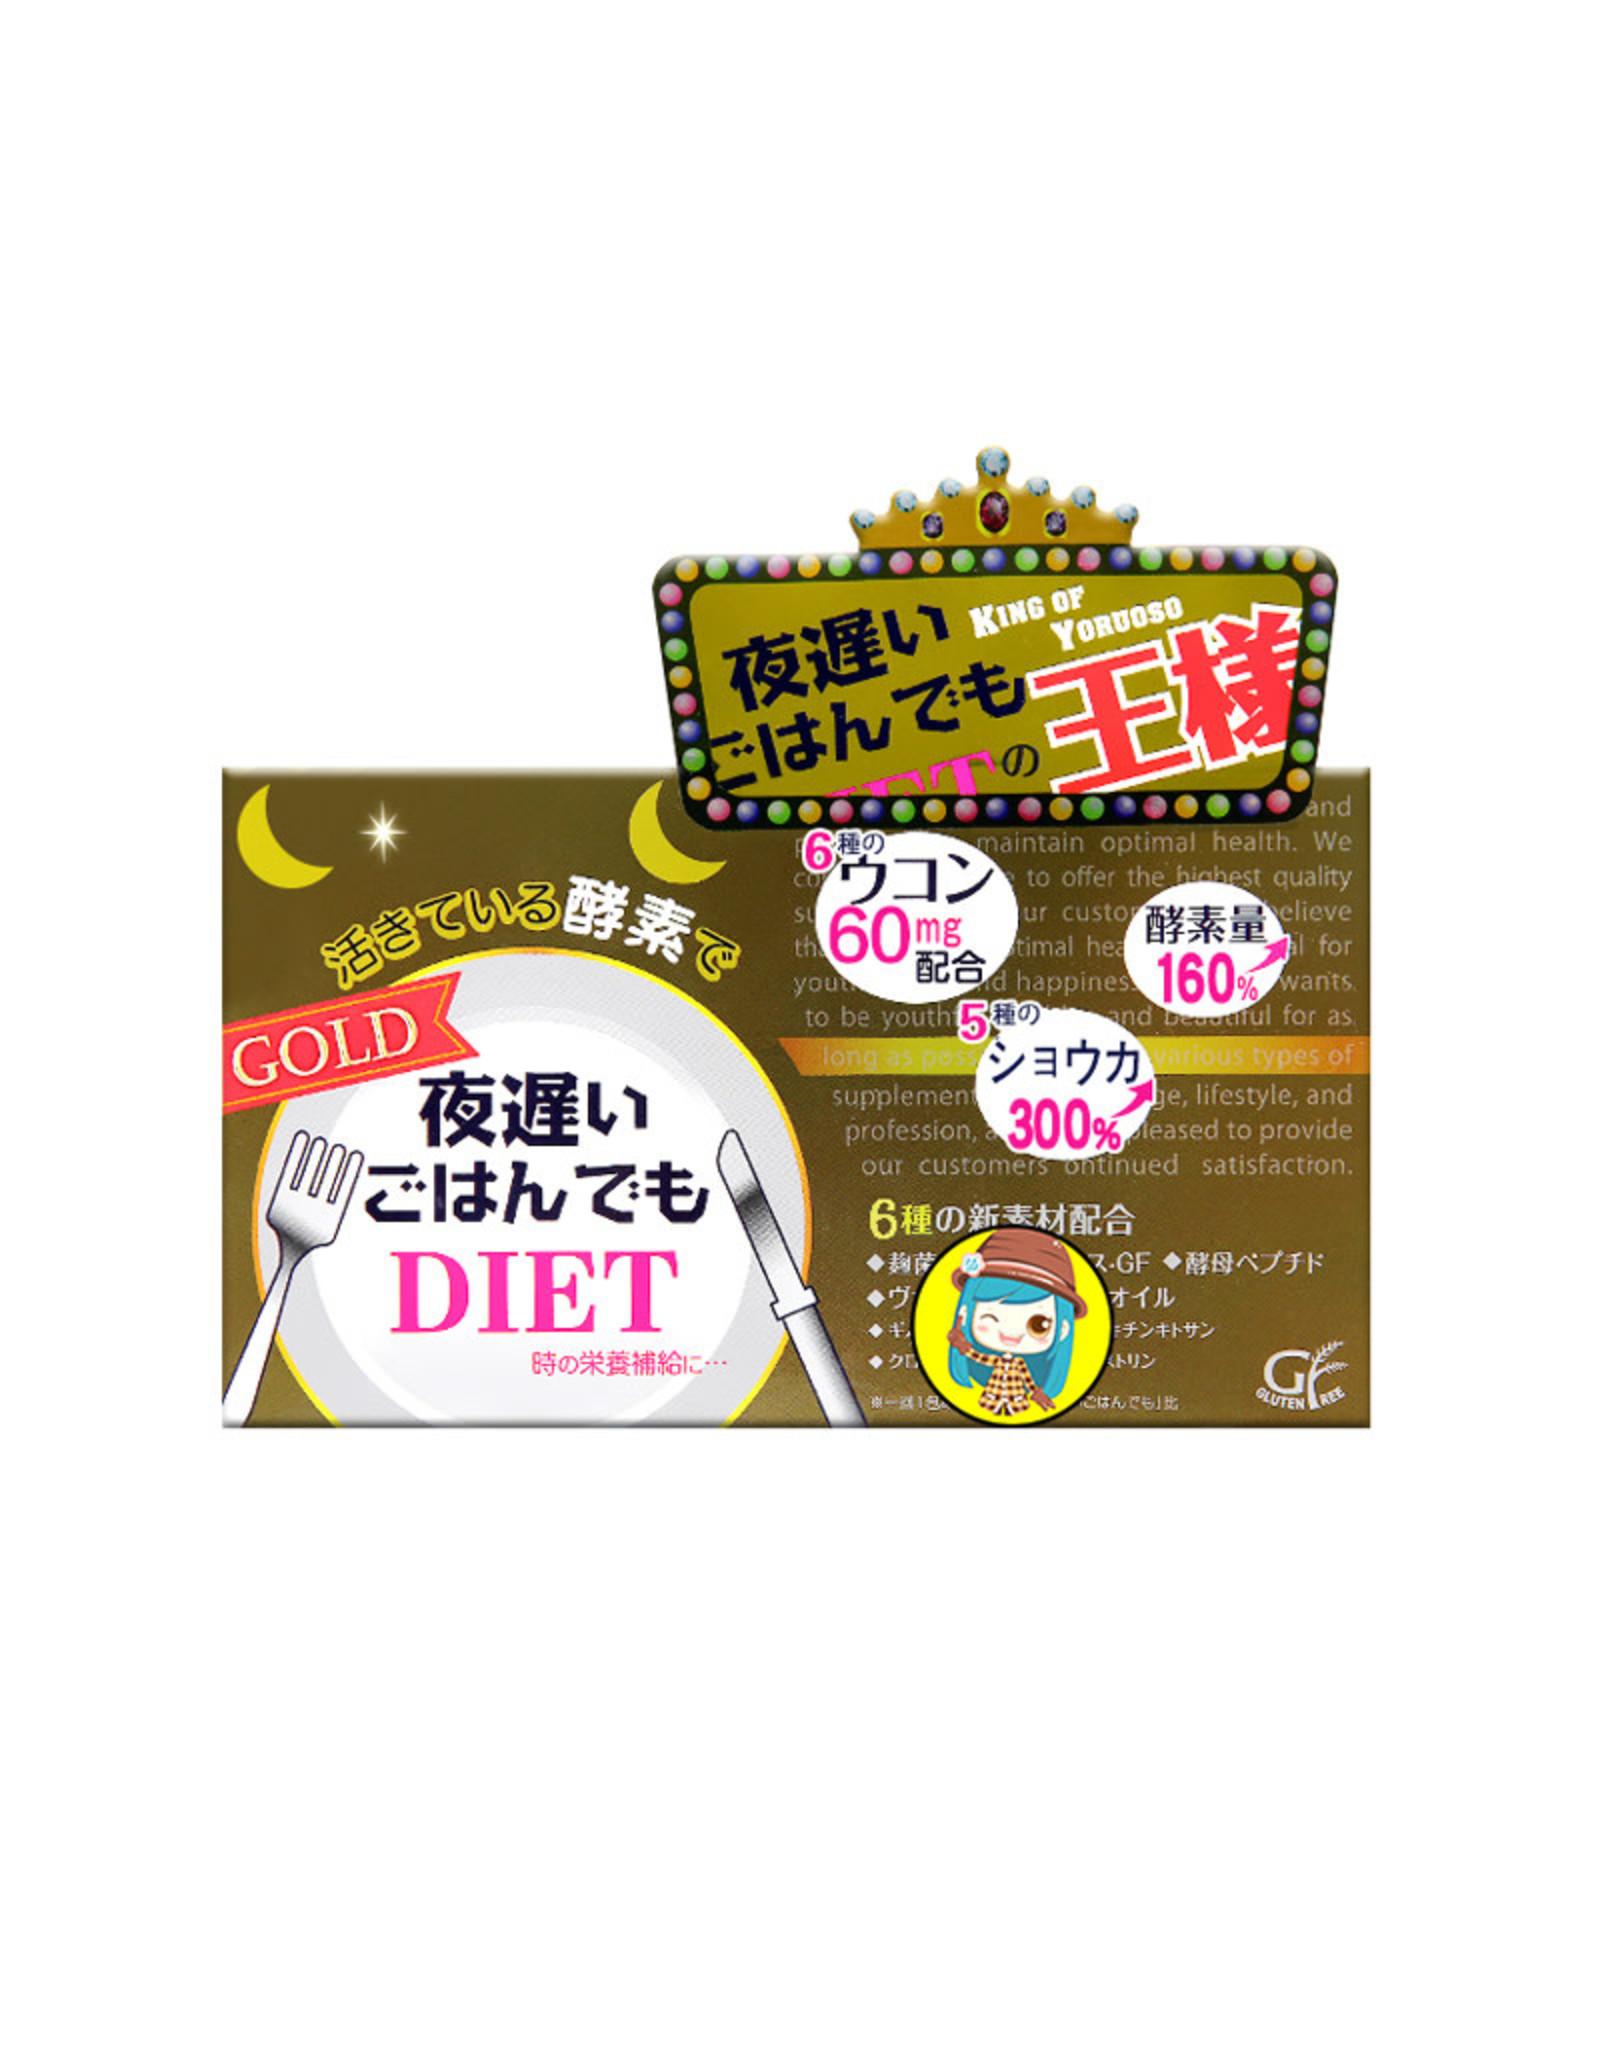 Yoru Osoi Gold 30 Days